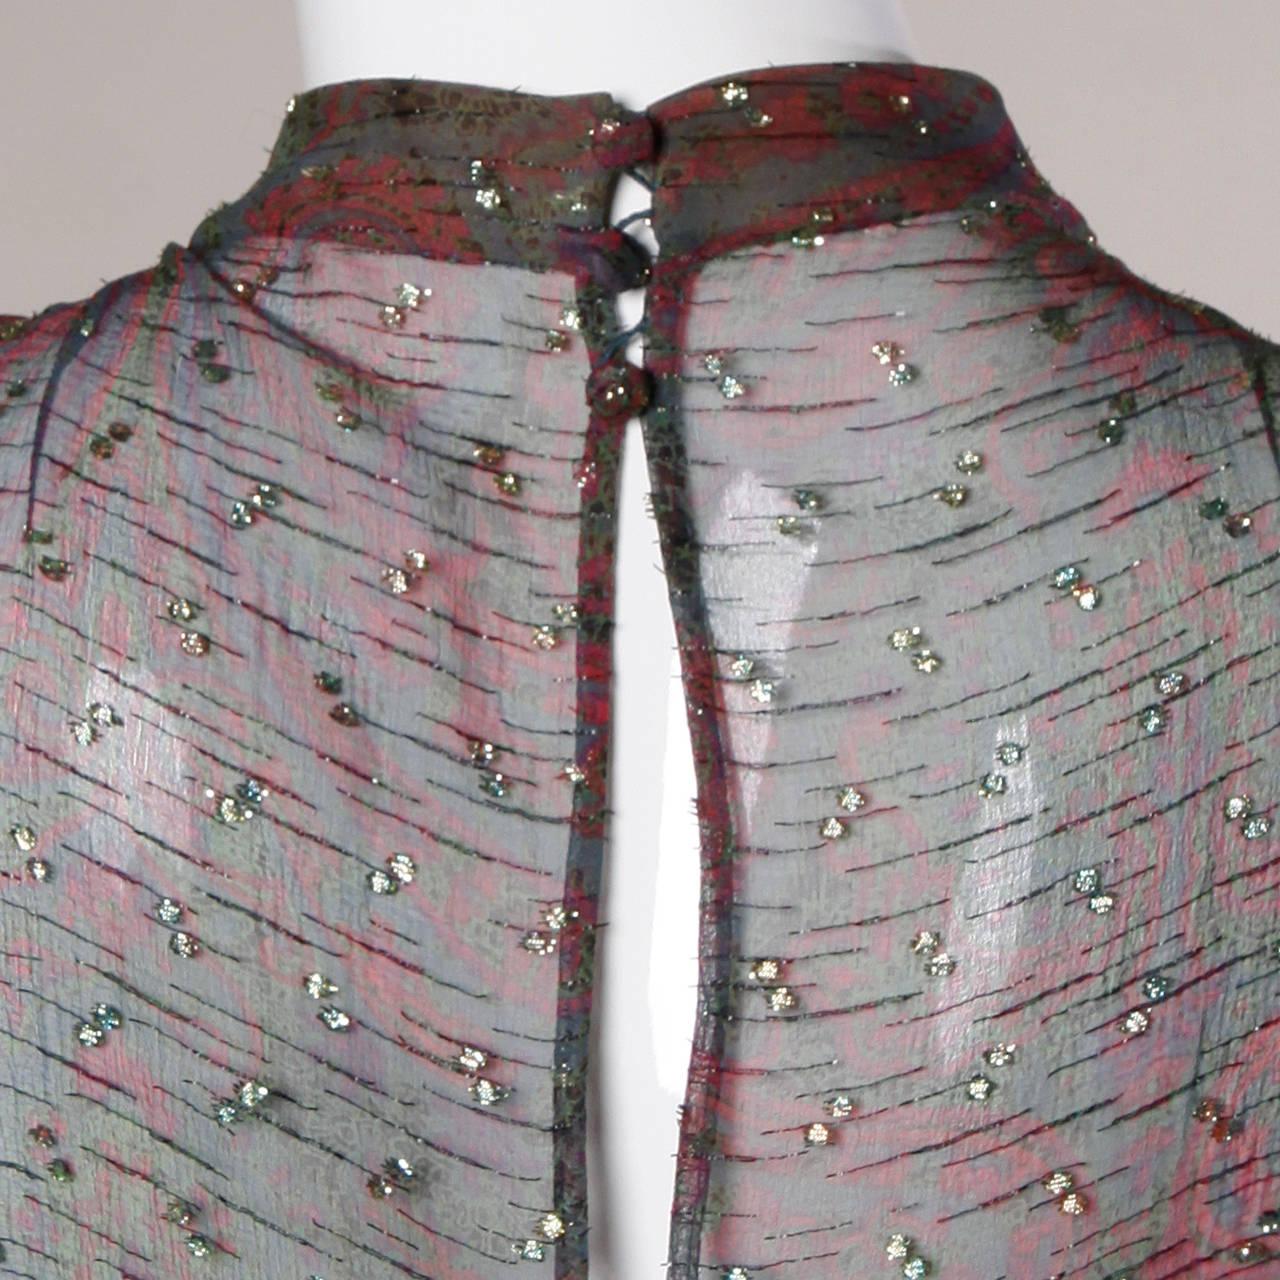 Women's Pauline Trigere Vintage 1970s Metallic Silk 3-Piece Dress + Sash For Sale